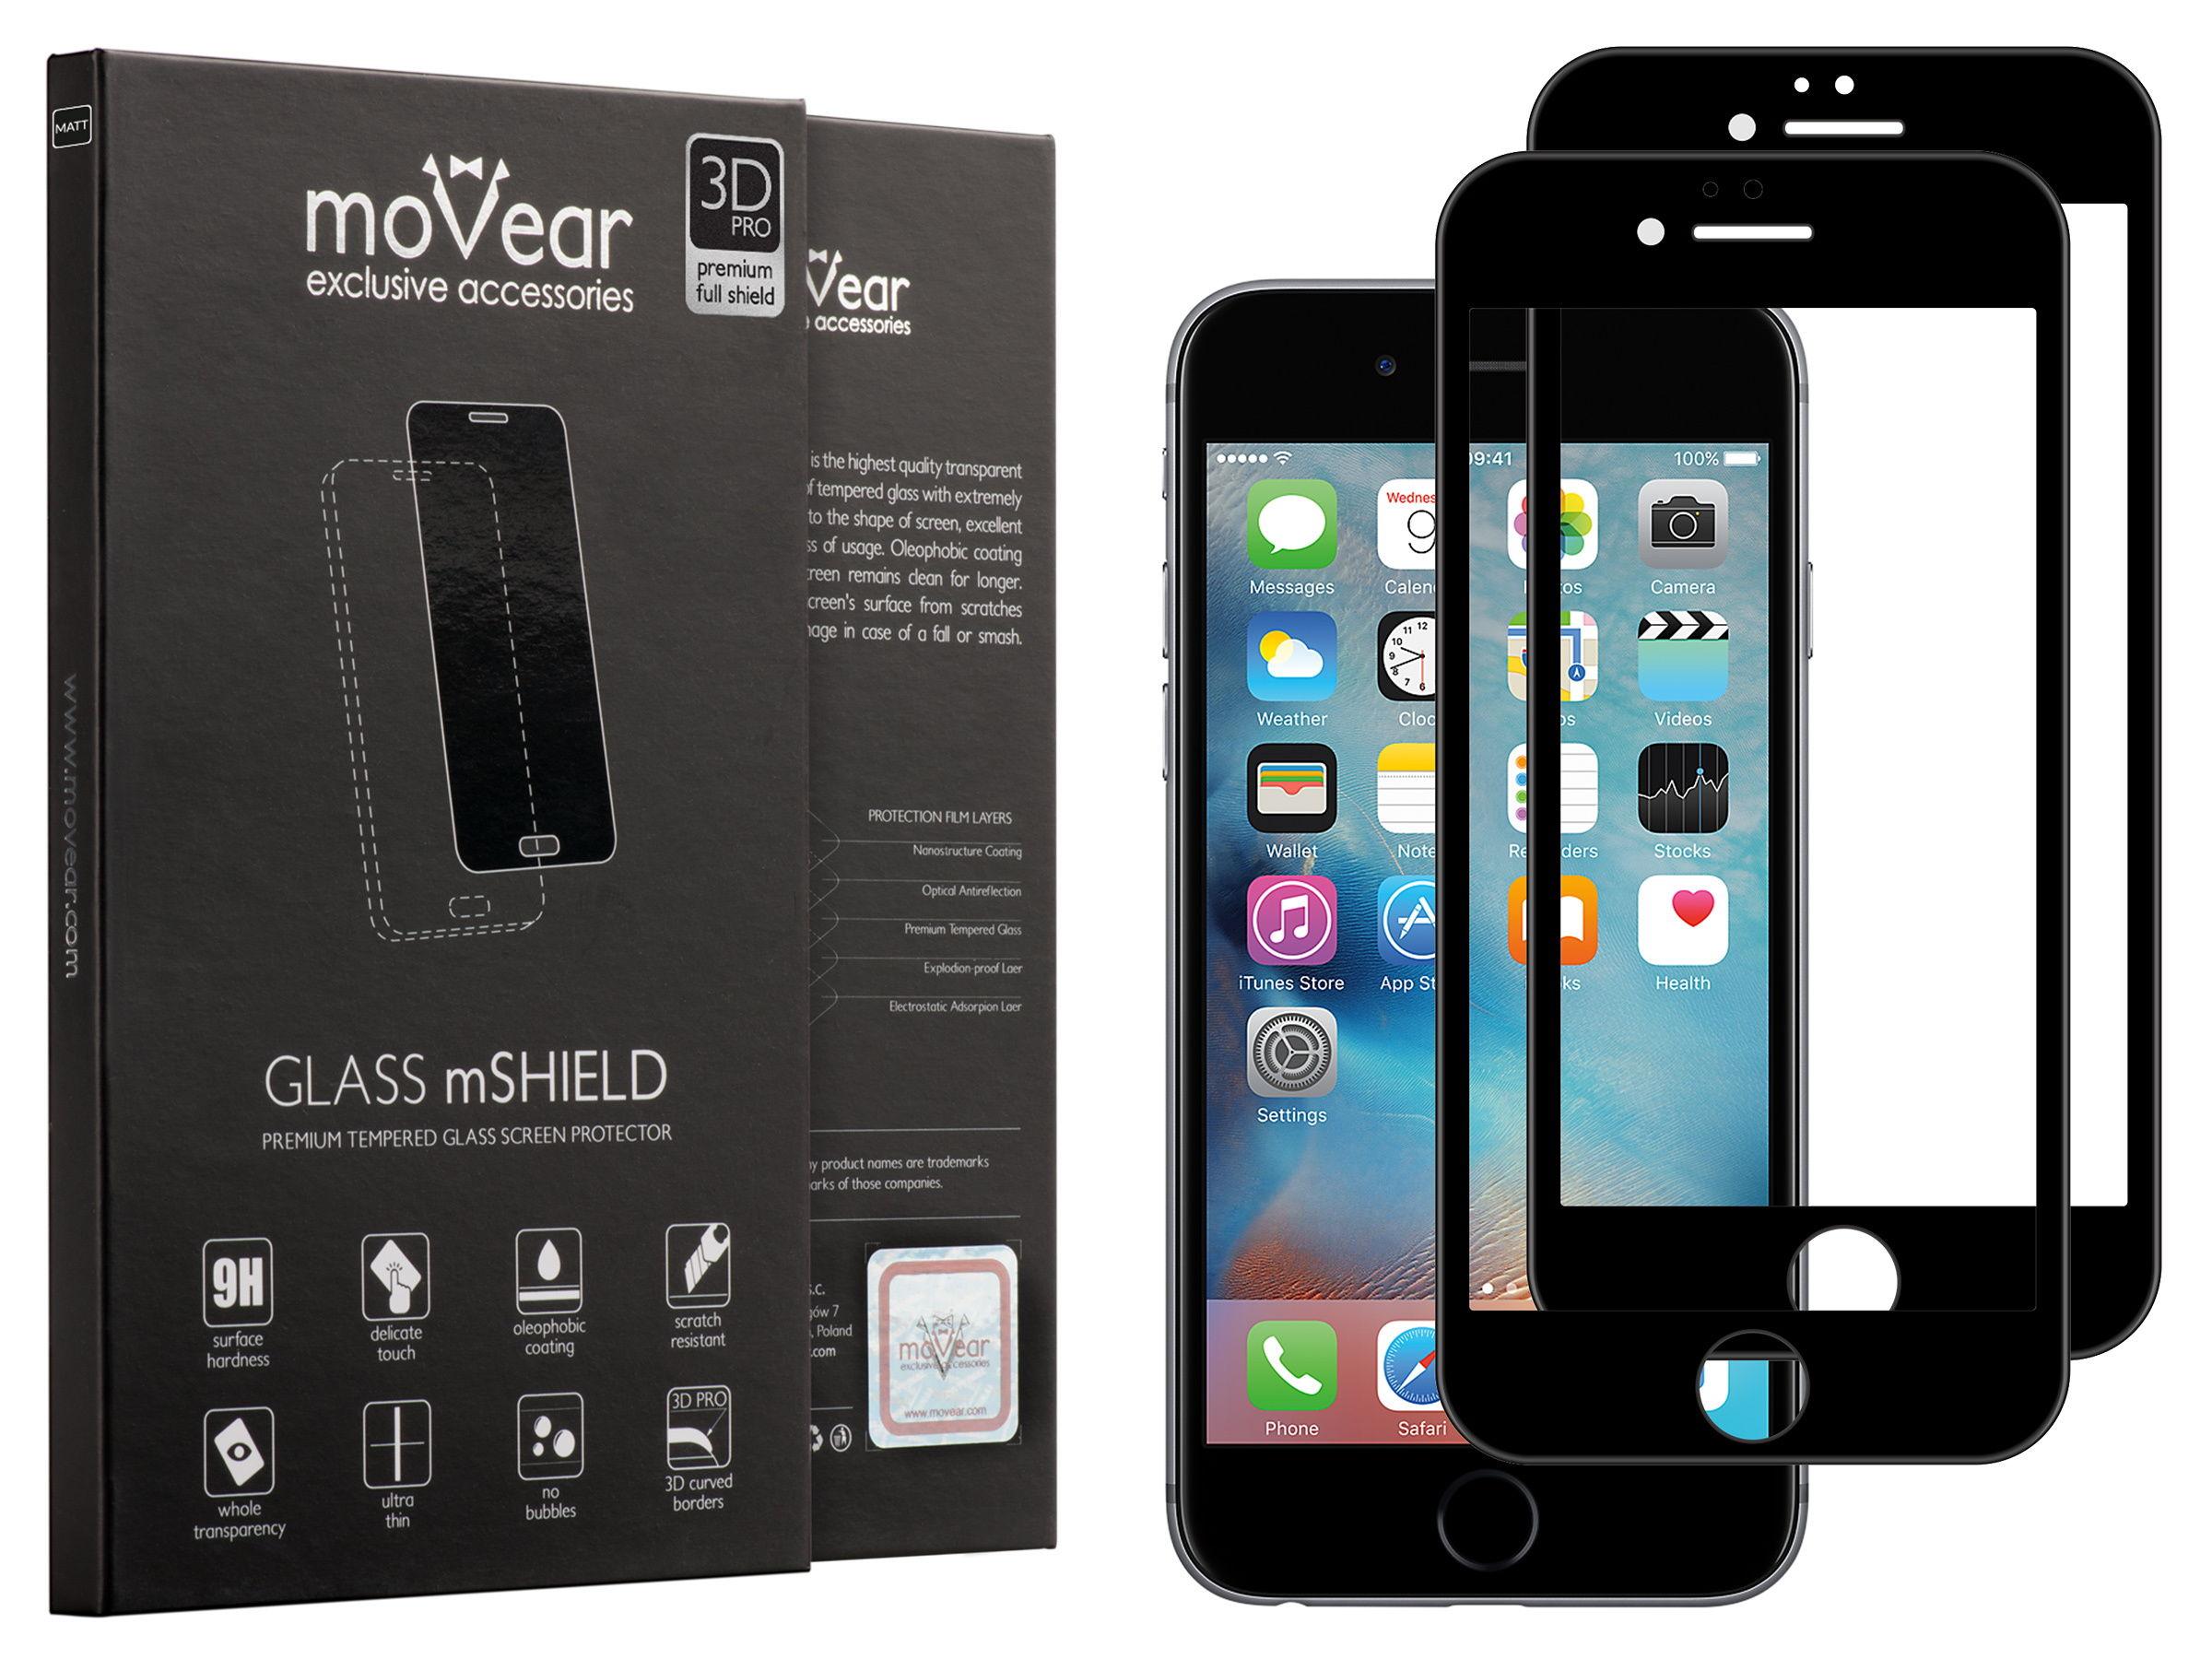 2 szt. | moVear Matowe Szkło Hartowane 3D PRO MATT na Apple iPhone 6 / 6s | na Cały Ekran, Antyrefleksyjne, 9H | GLASS mSHIELD Czarny